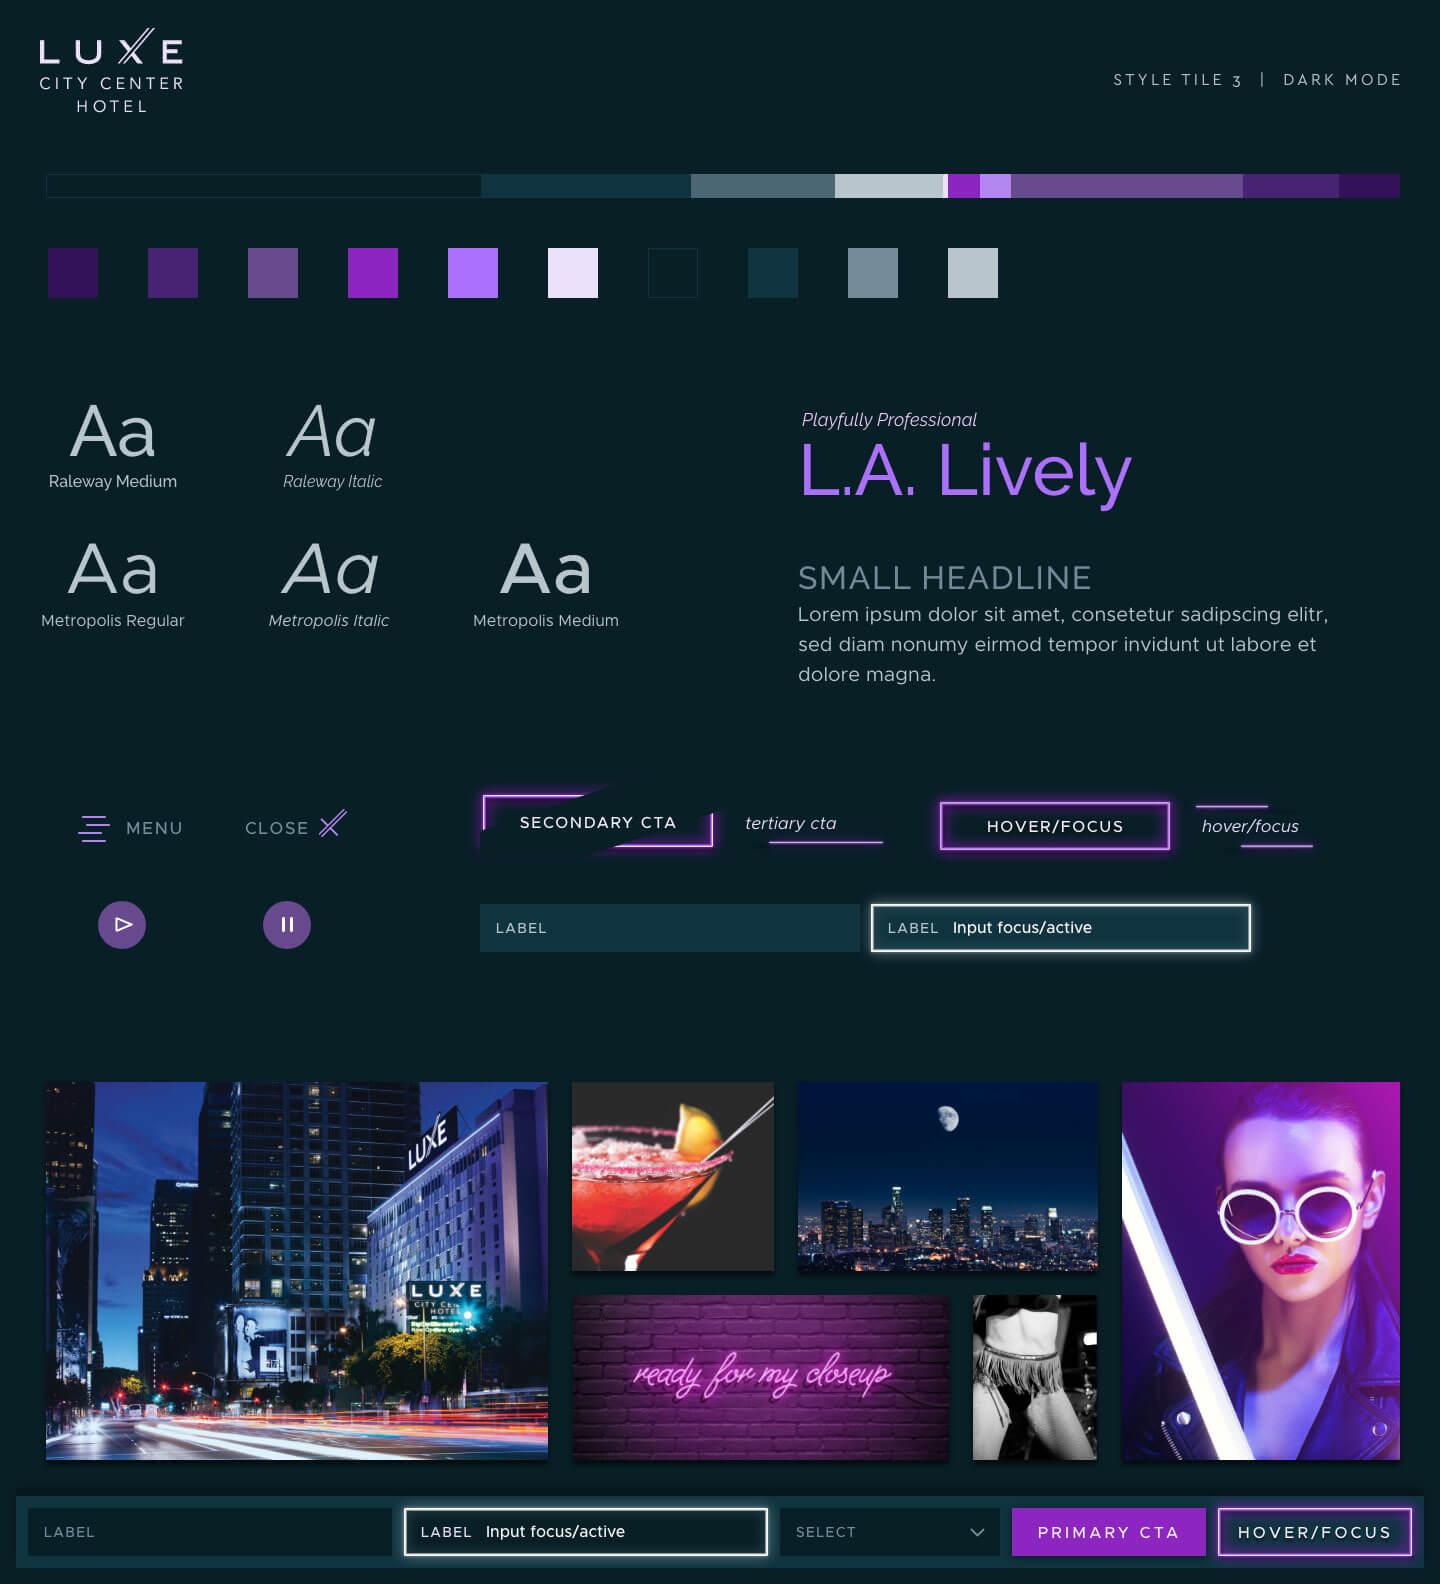 Style Tile Concept 3 - Dark Mode